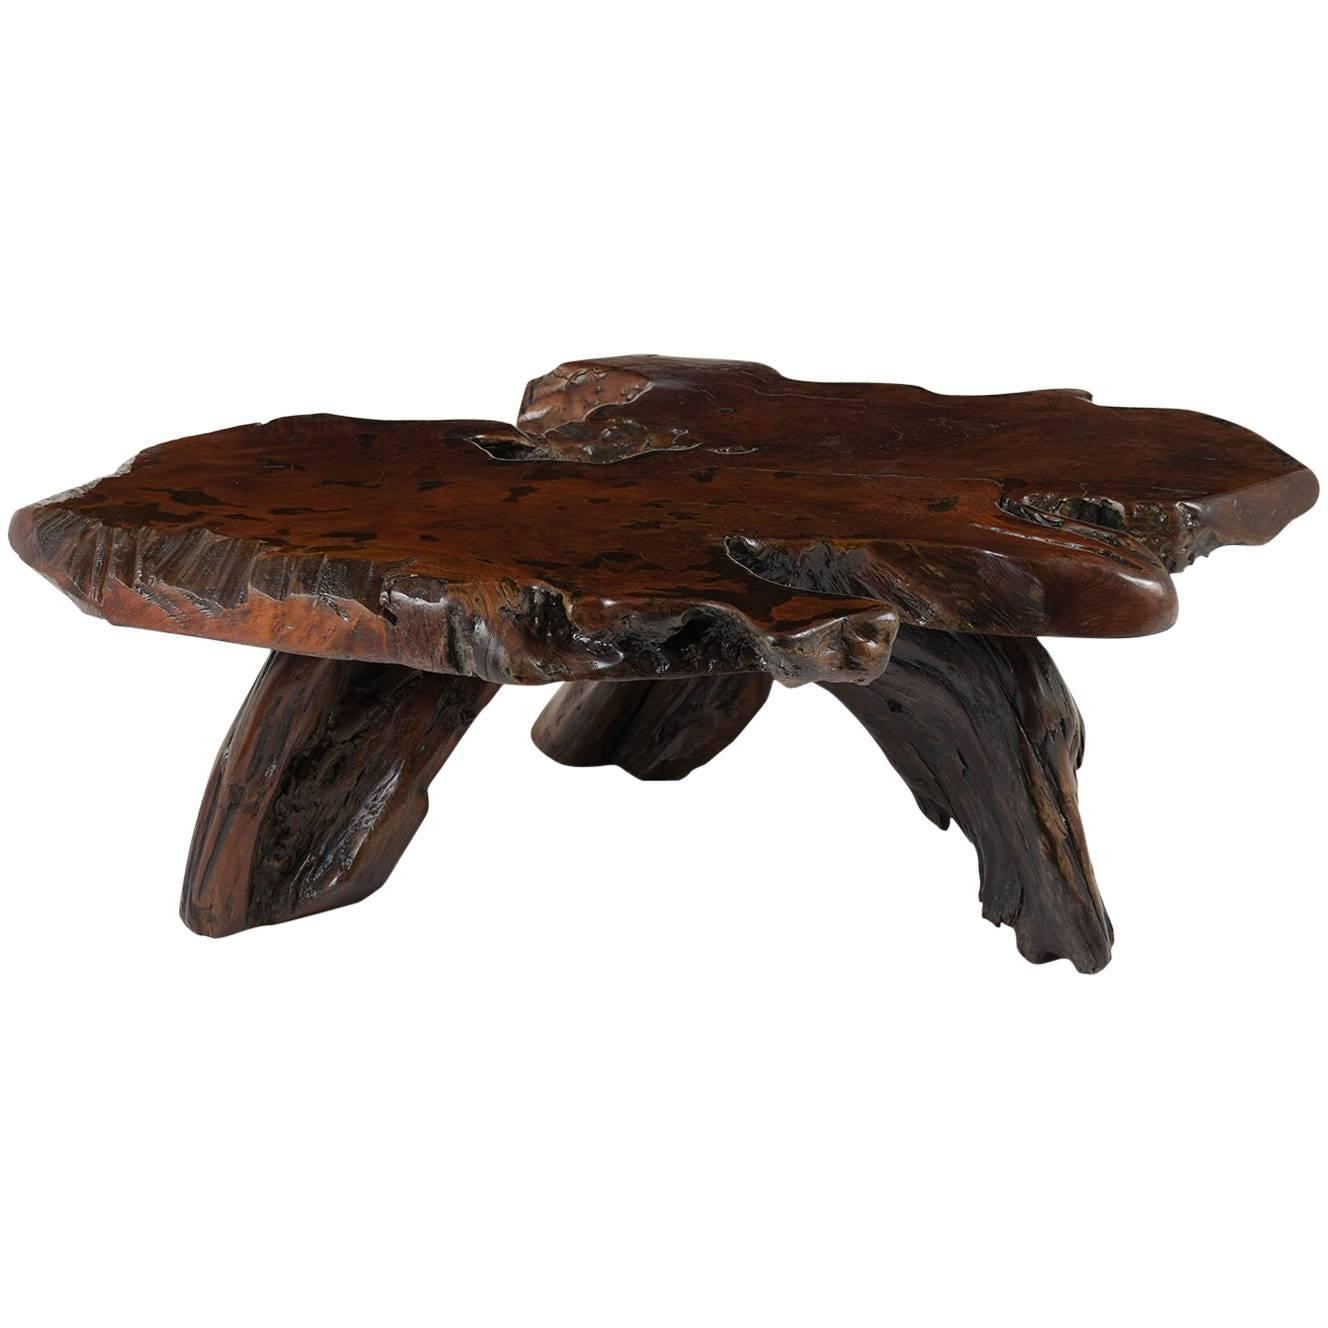 Organic Root Coffee Table